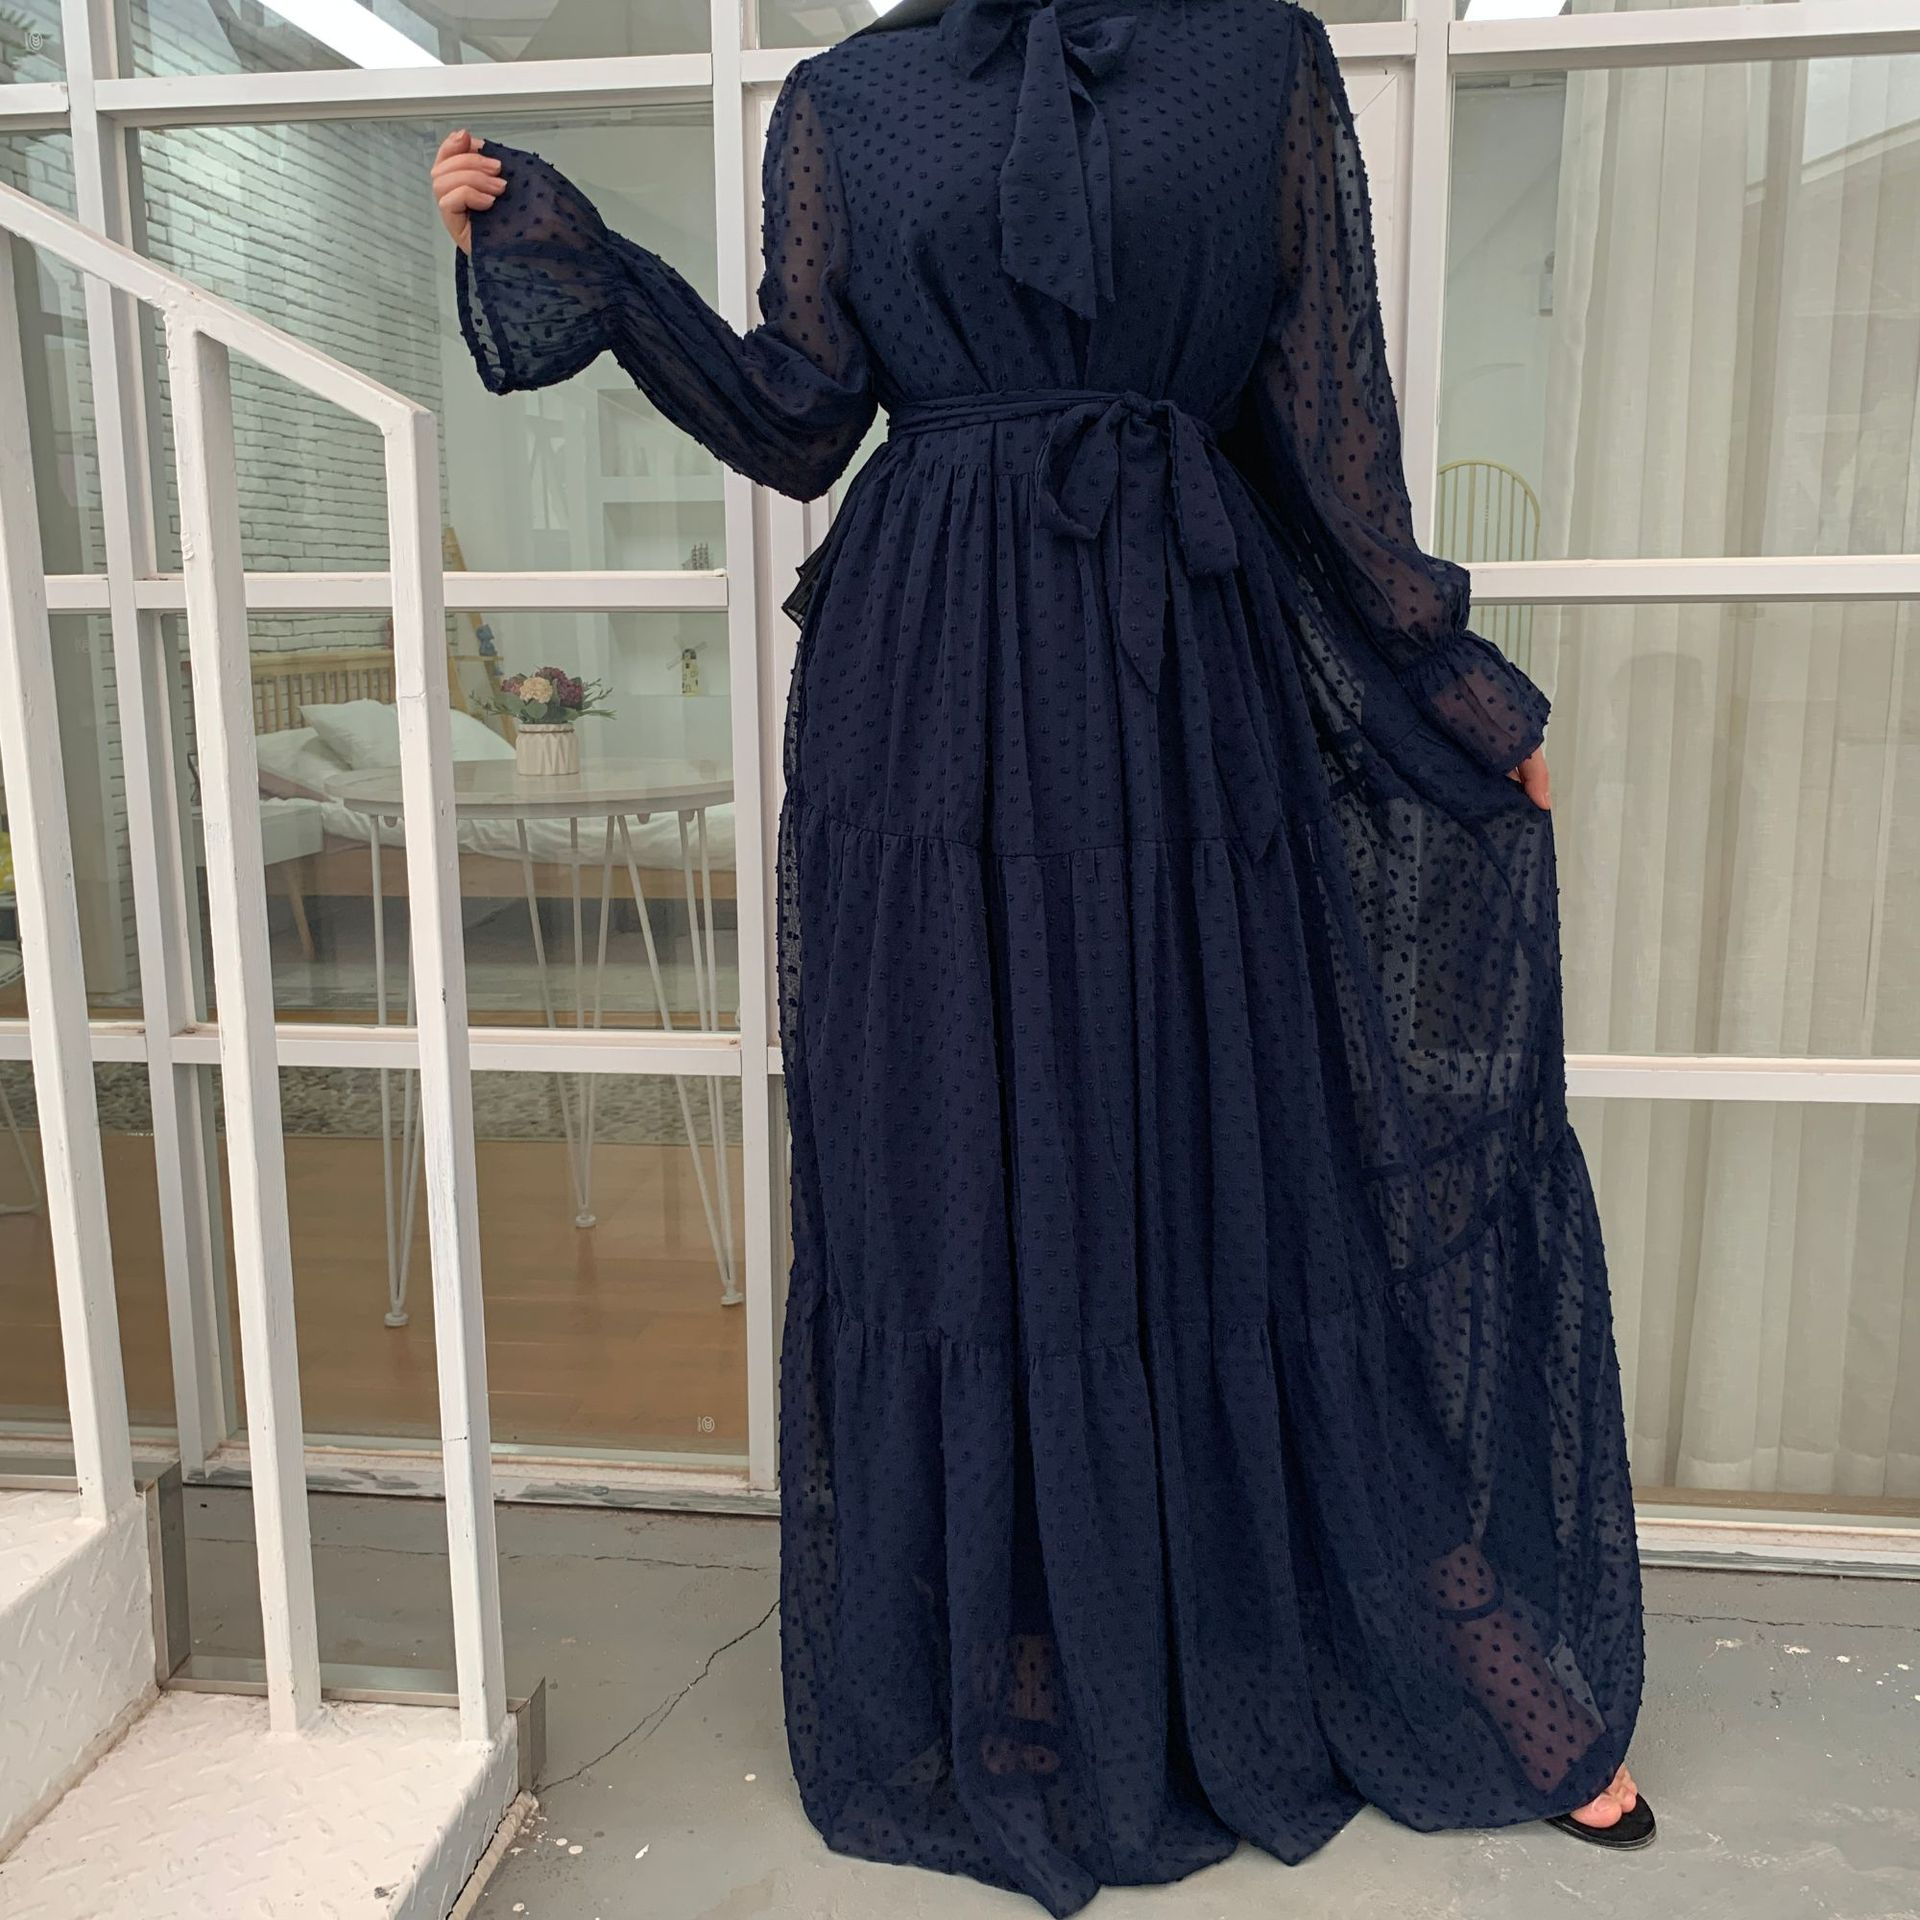 vestidos largos plus size dresses summer Long bandage woman dress 2020 robe ete femme longue ropa mujer sukienki korean fashion